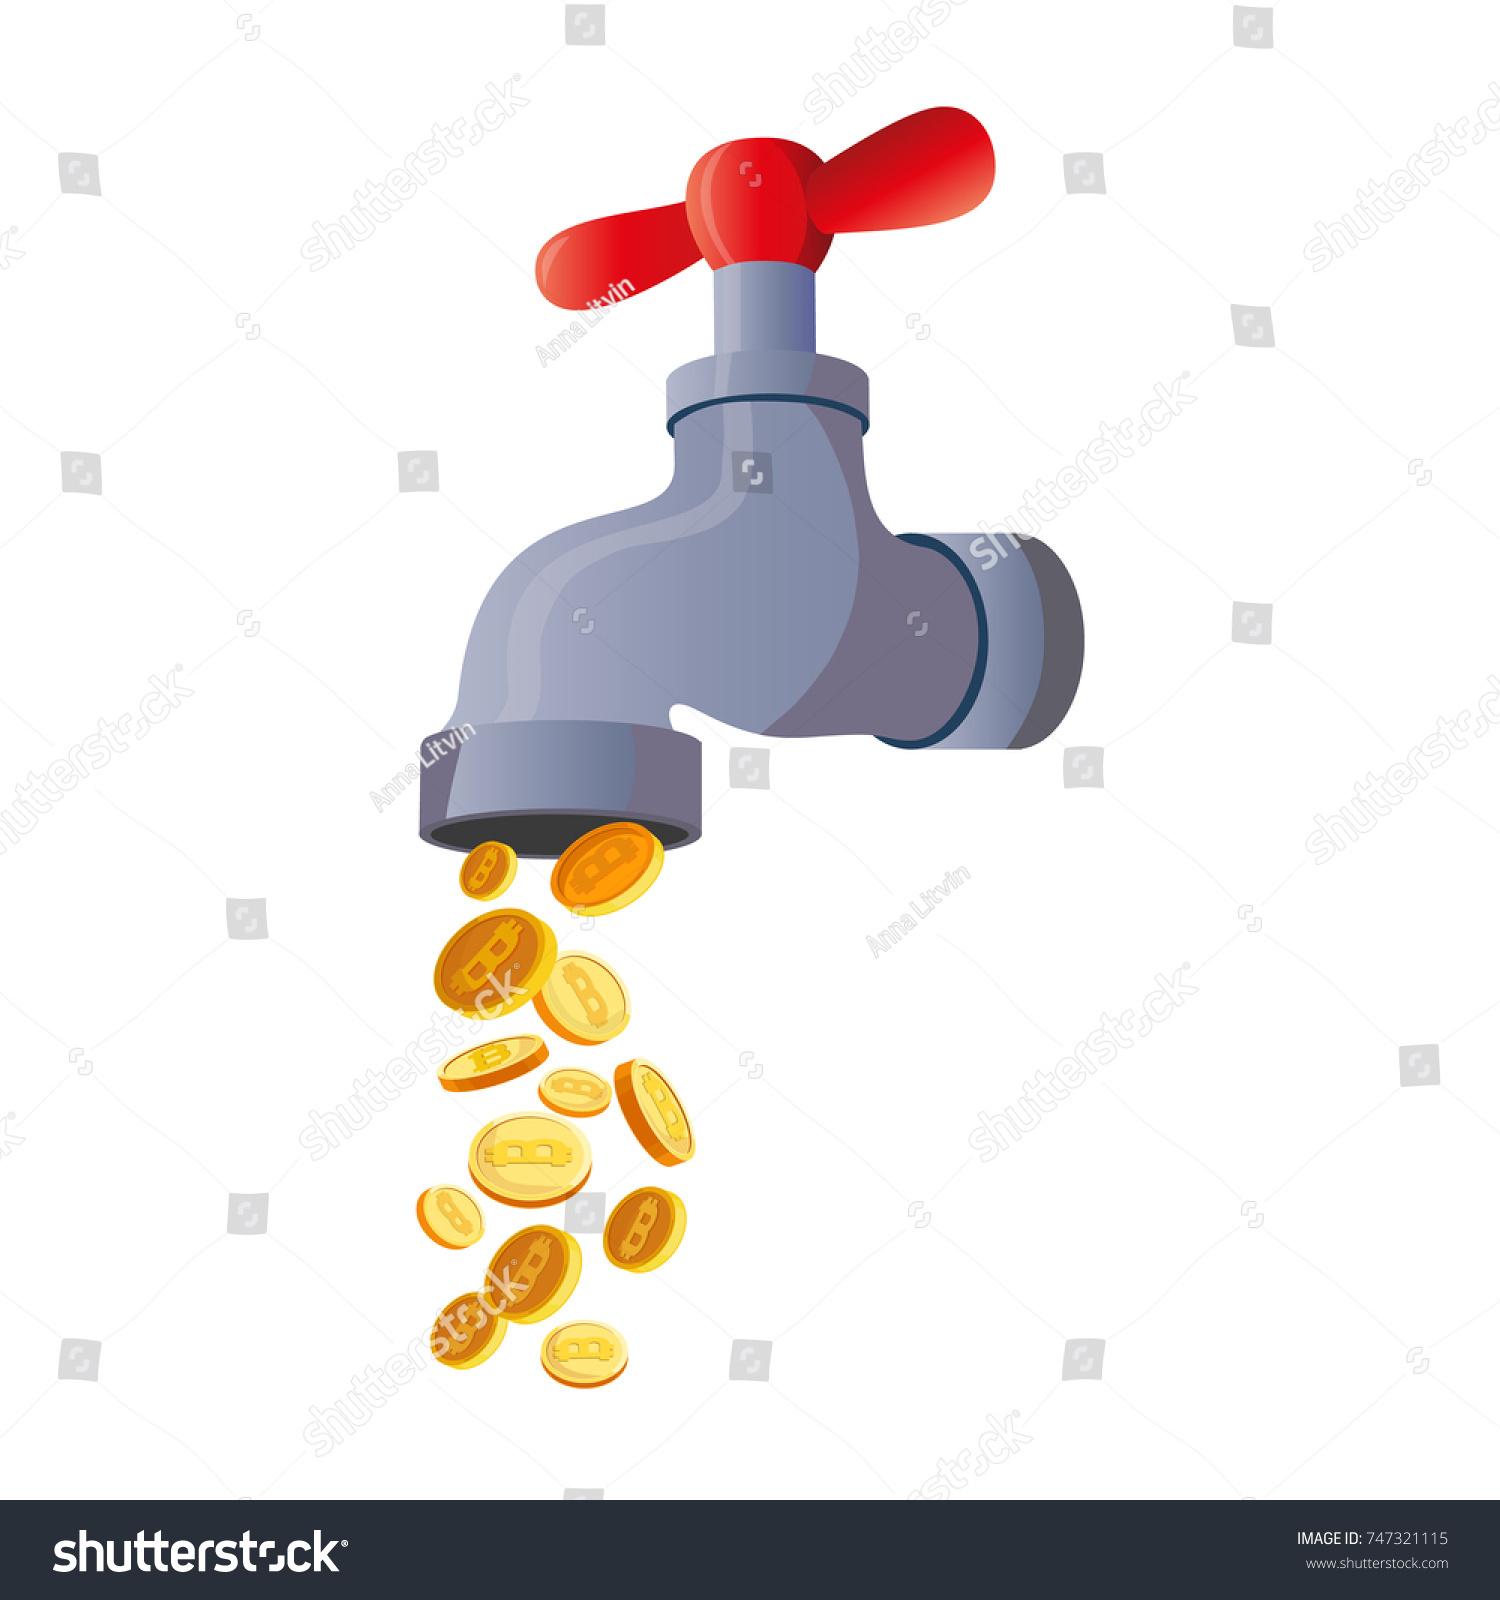 Bitcoin Faucet Water Tap Coins Stock Vector 747321115 - Shutterstock